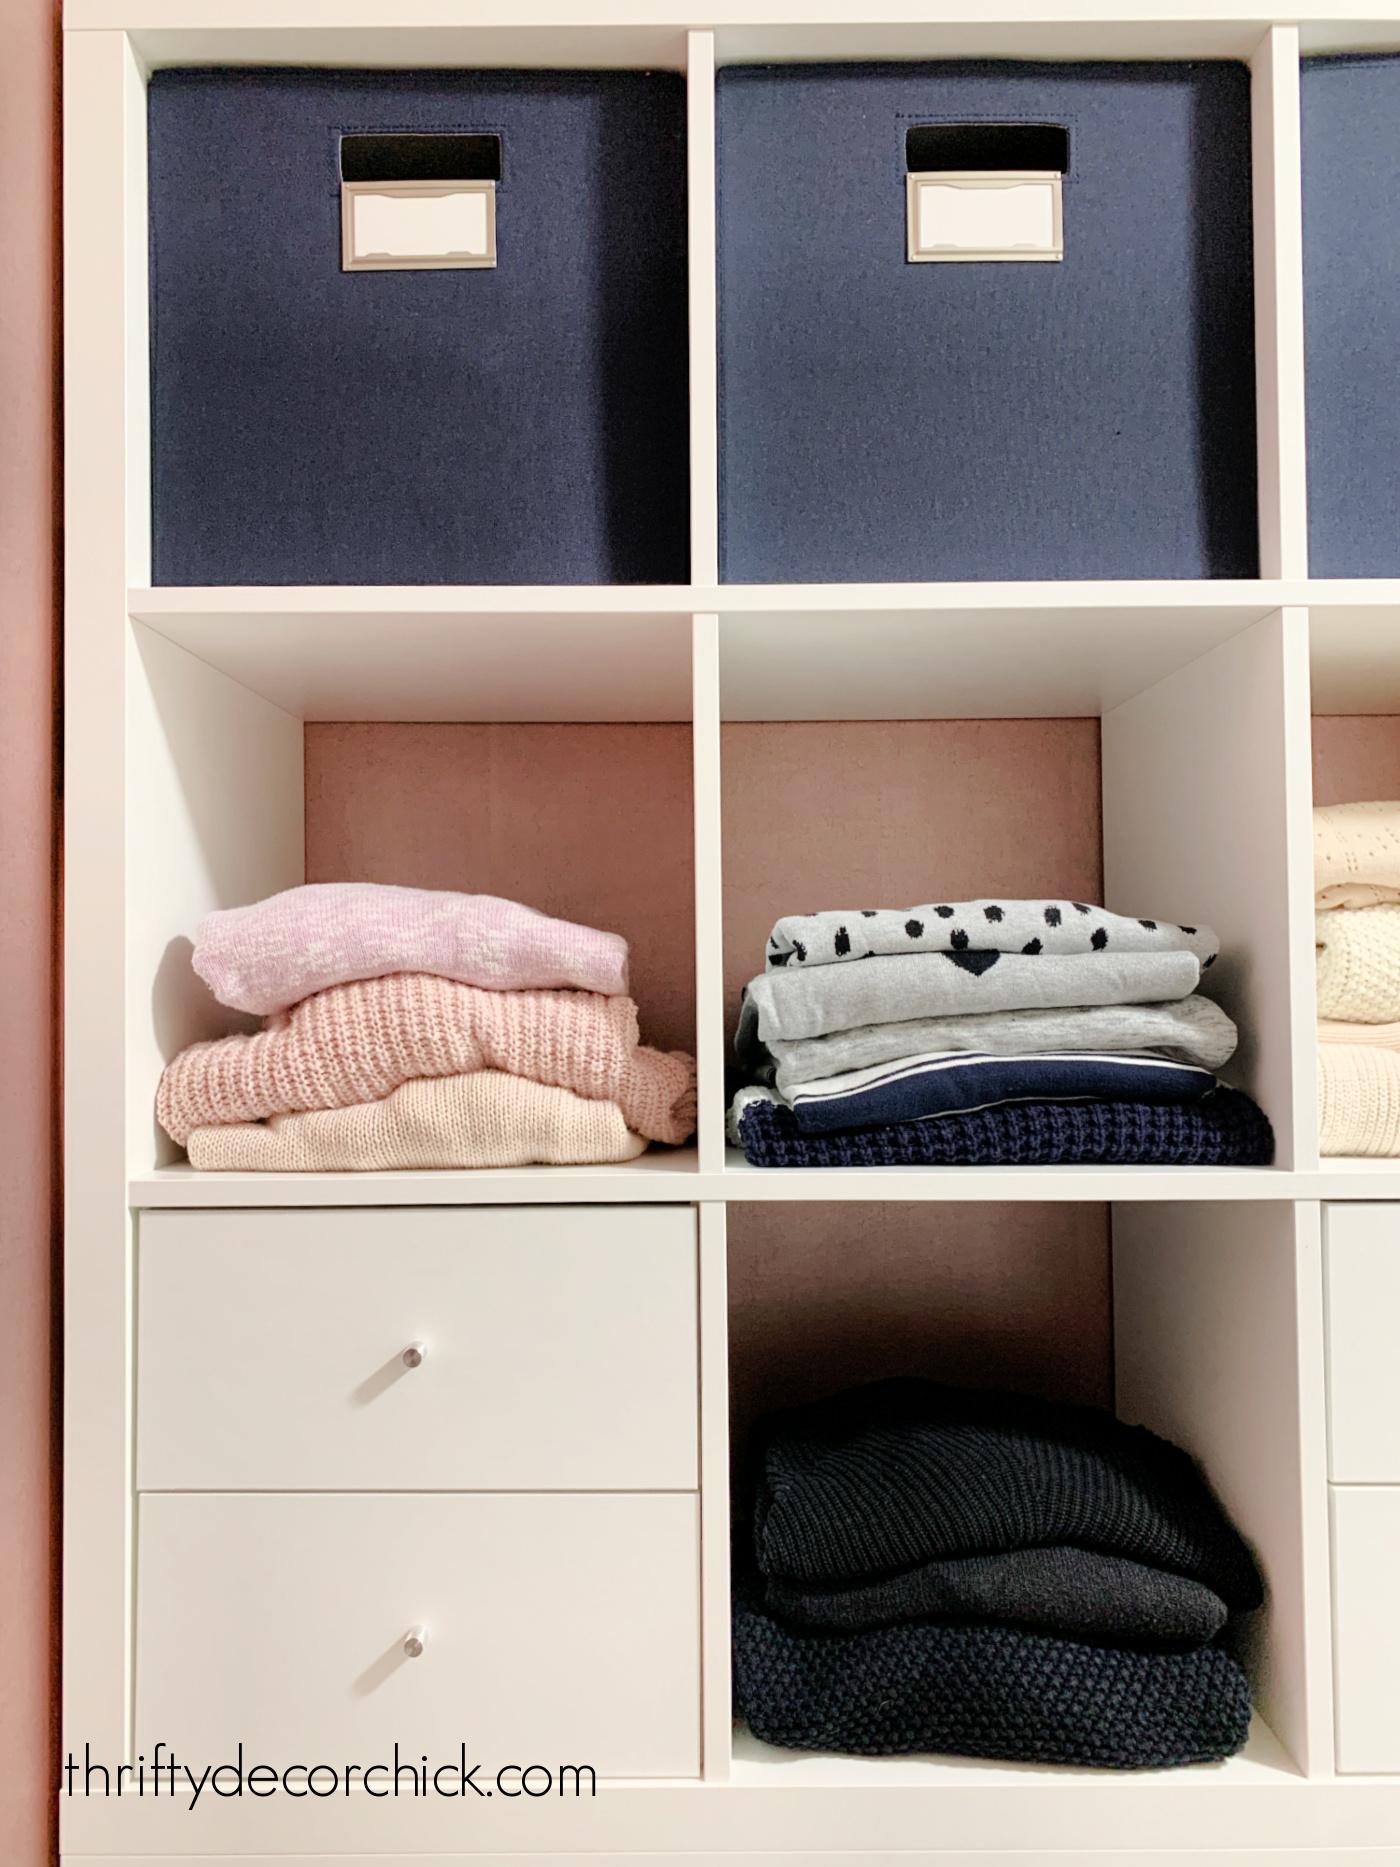 Kallax closet storage hack with drawers